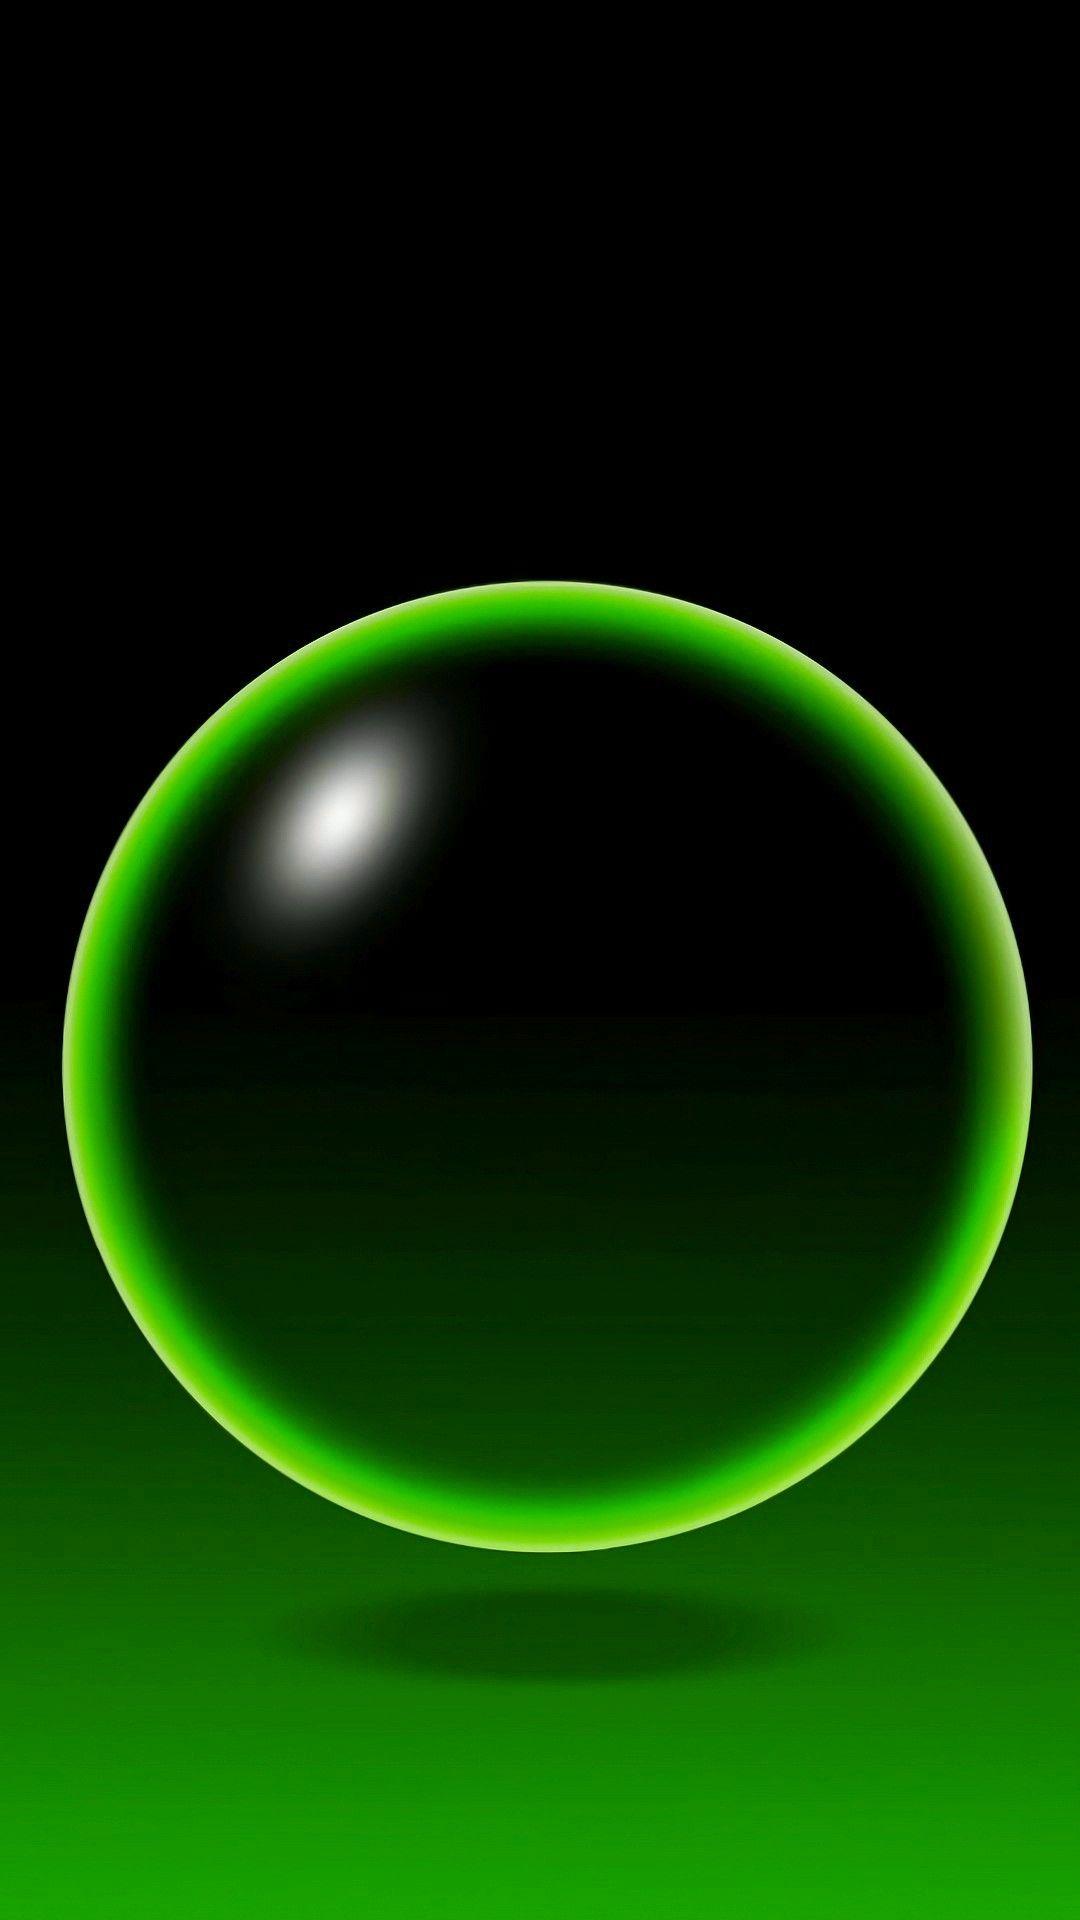 Green Galaxy Dark Green Wallpaper Dark Green Aesthetic Green Galaxy